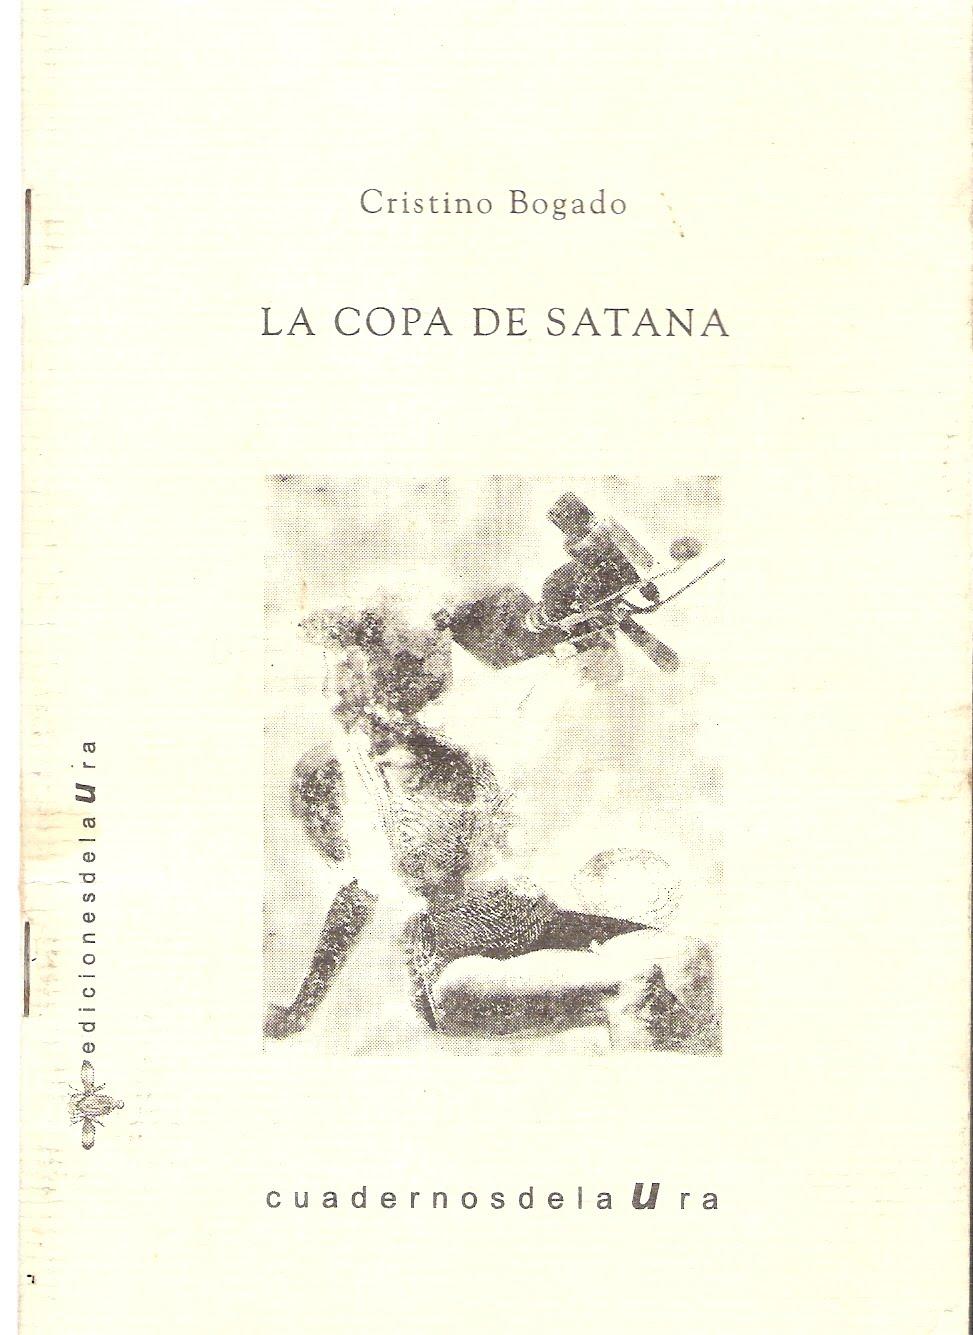 La Copa de Satana